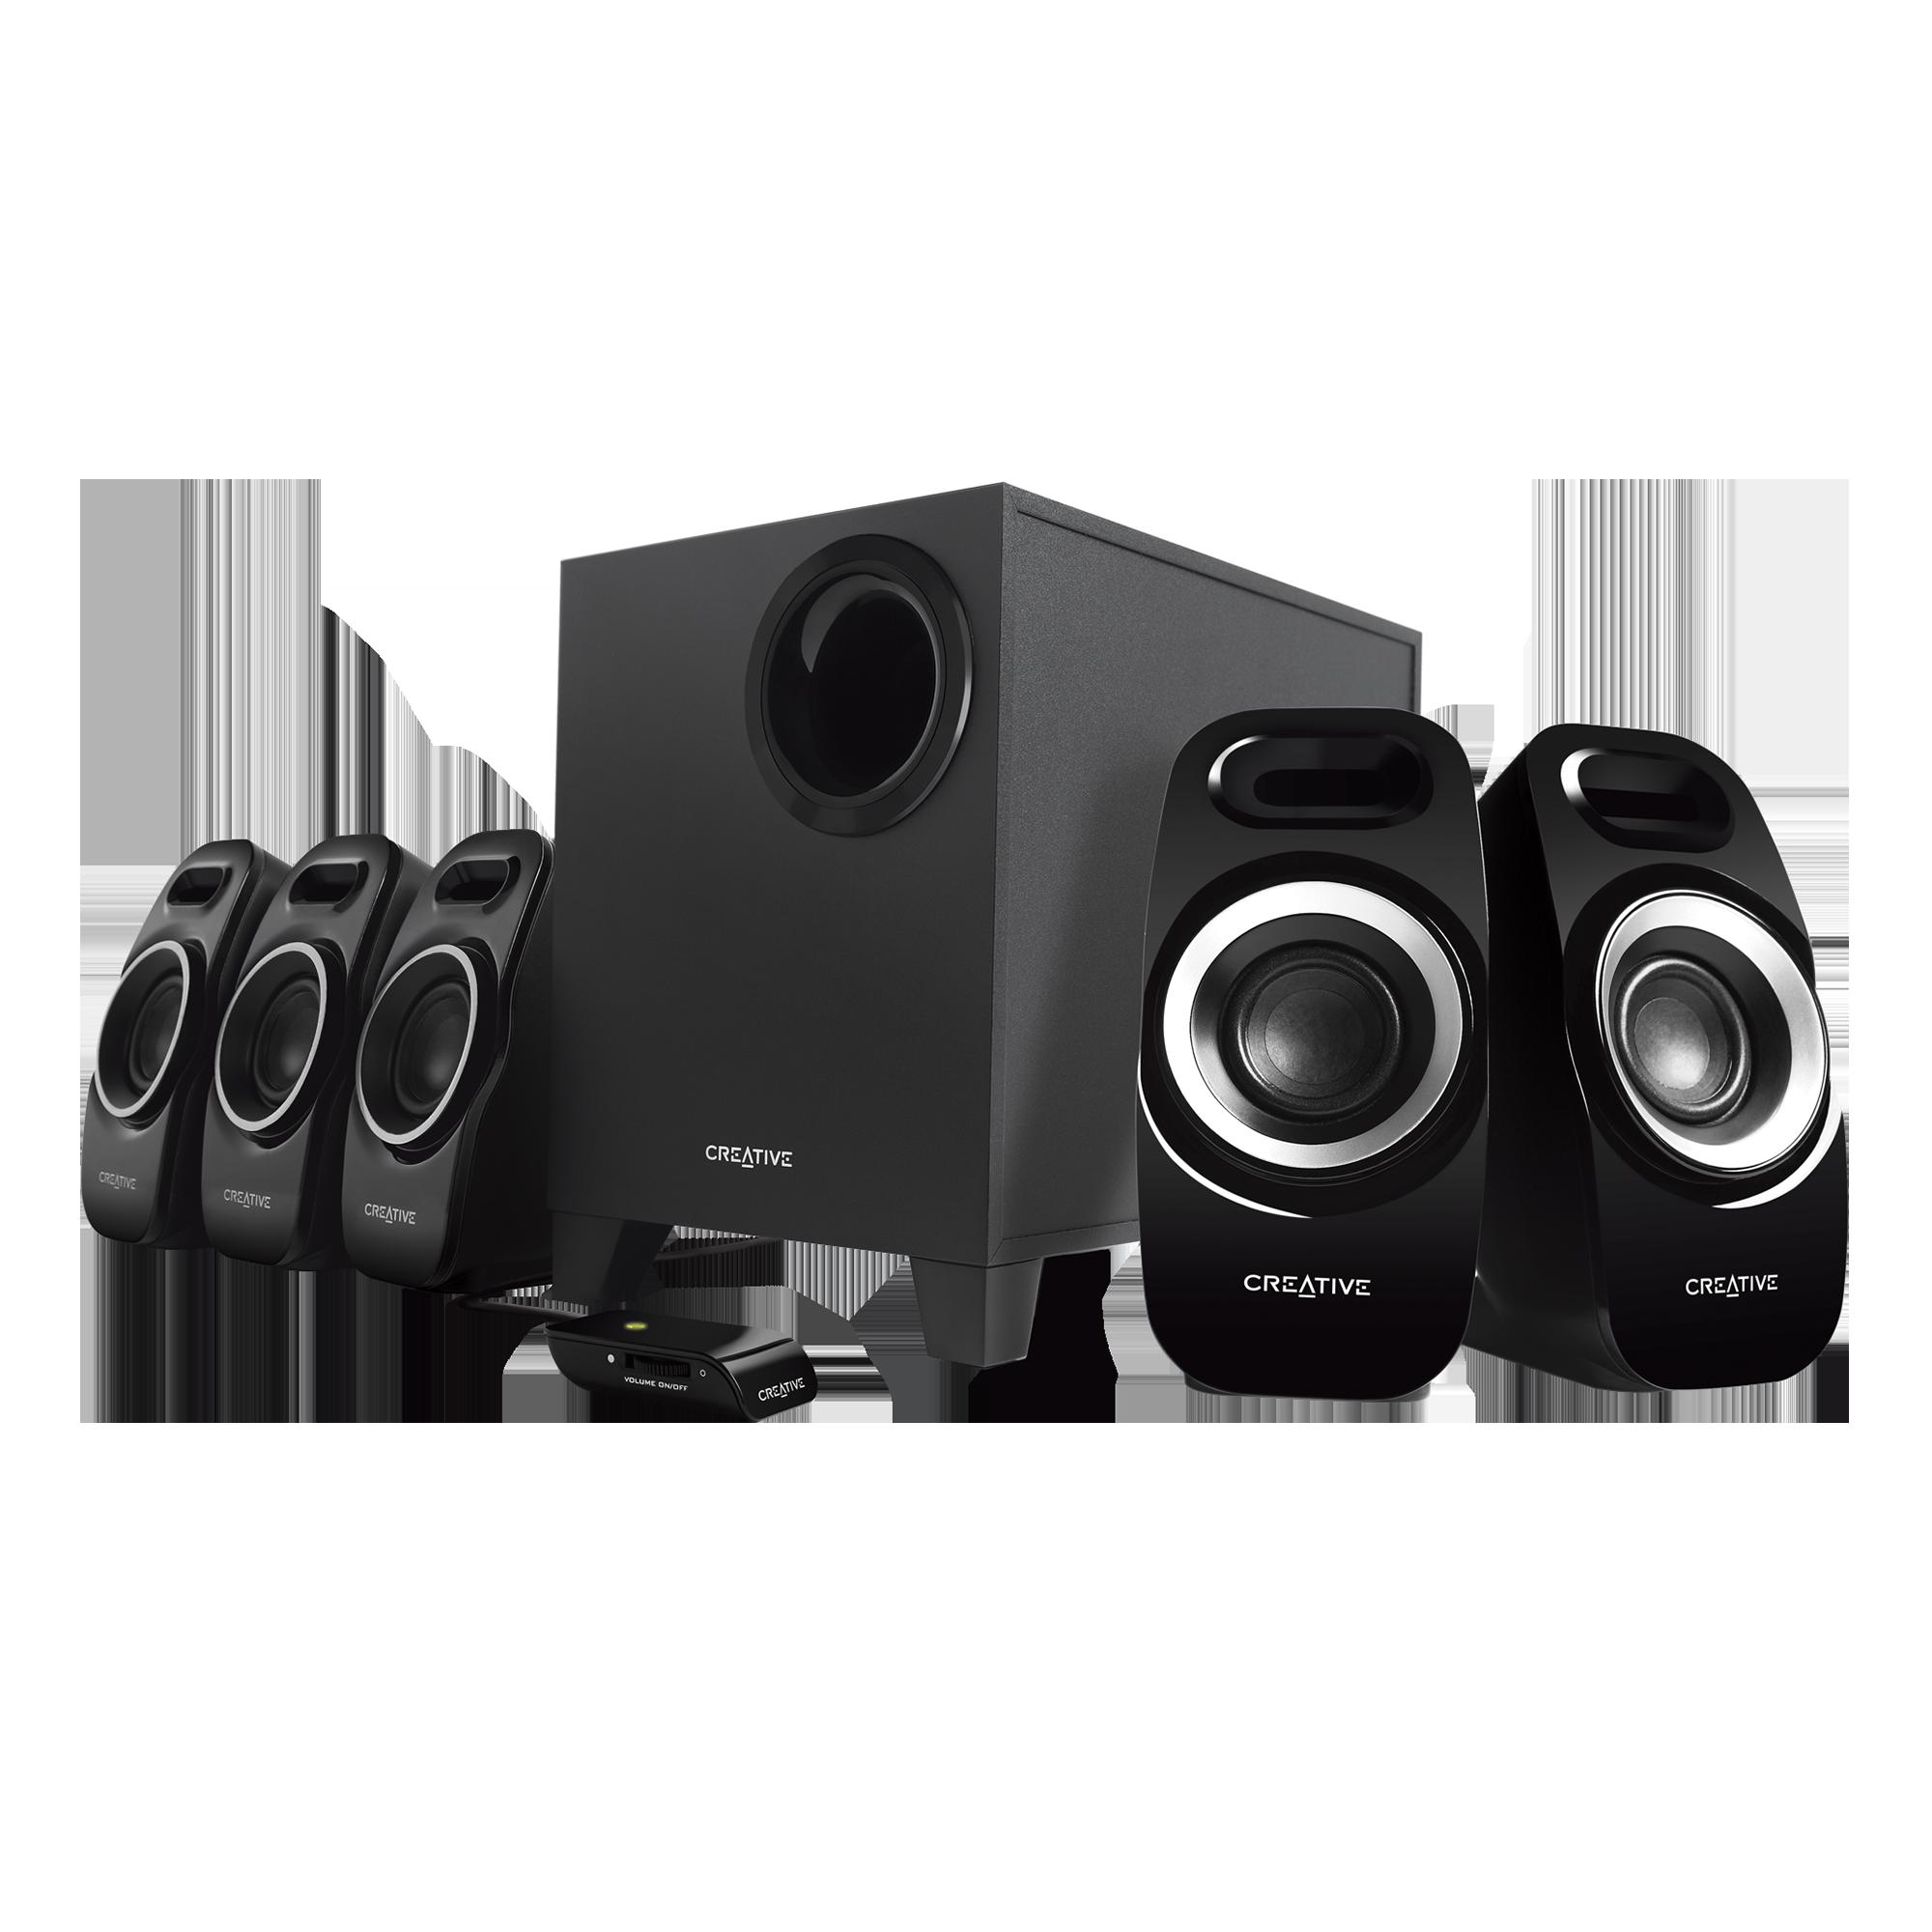 creative-inspire-t6300-euro-plug